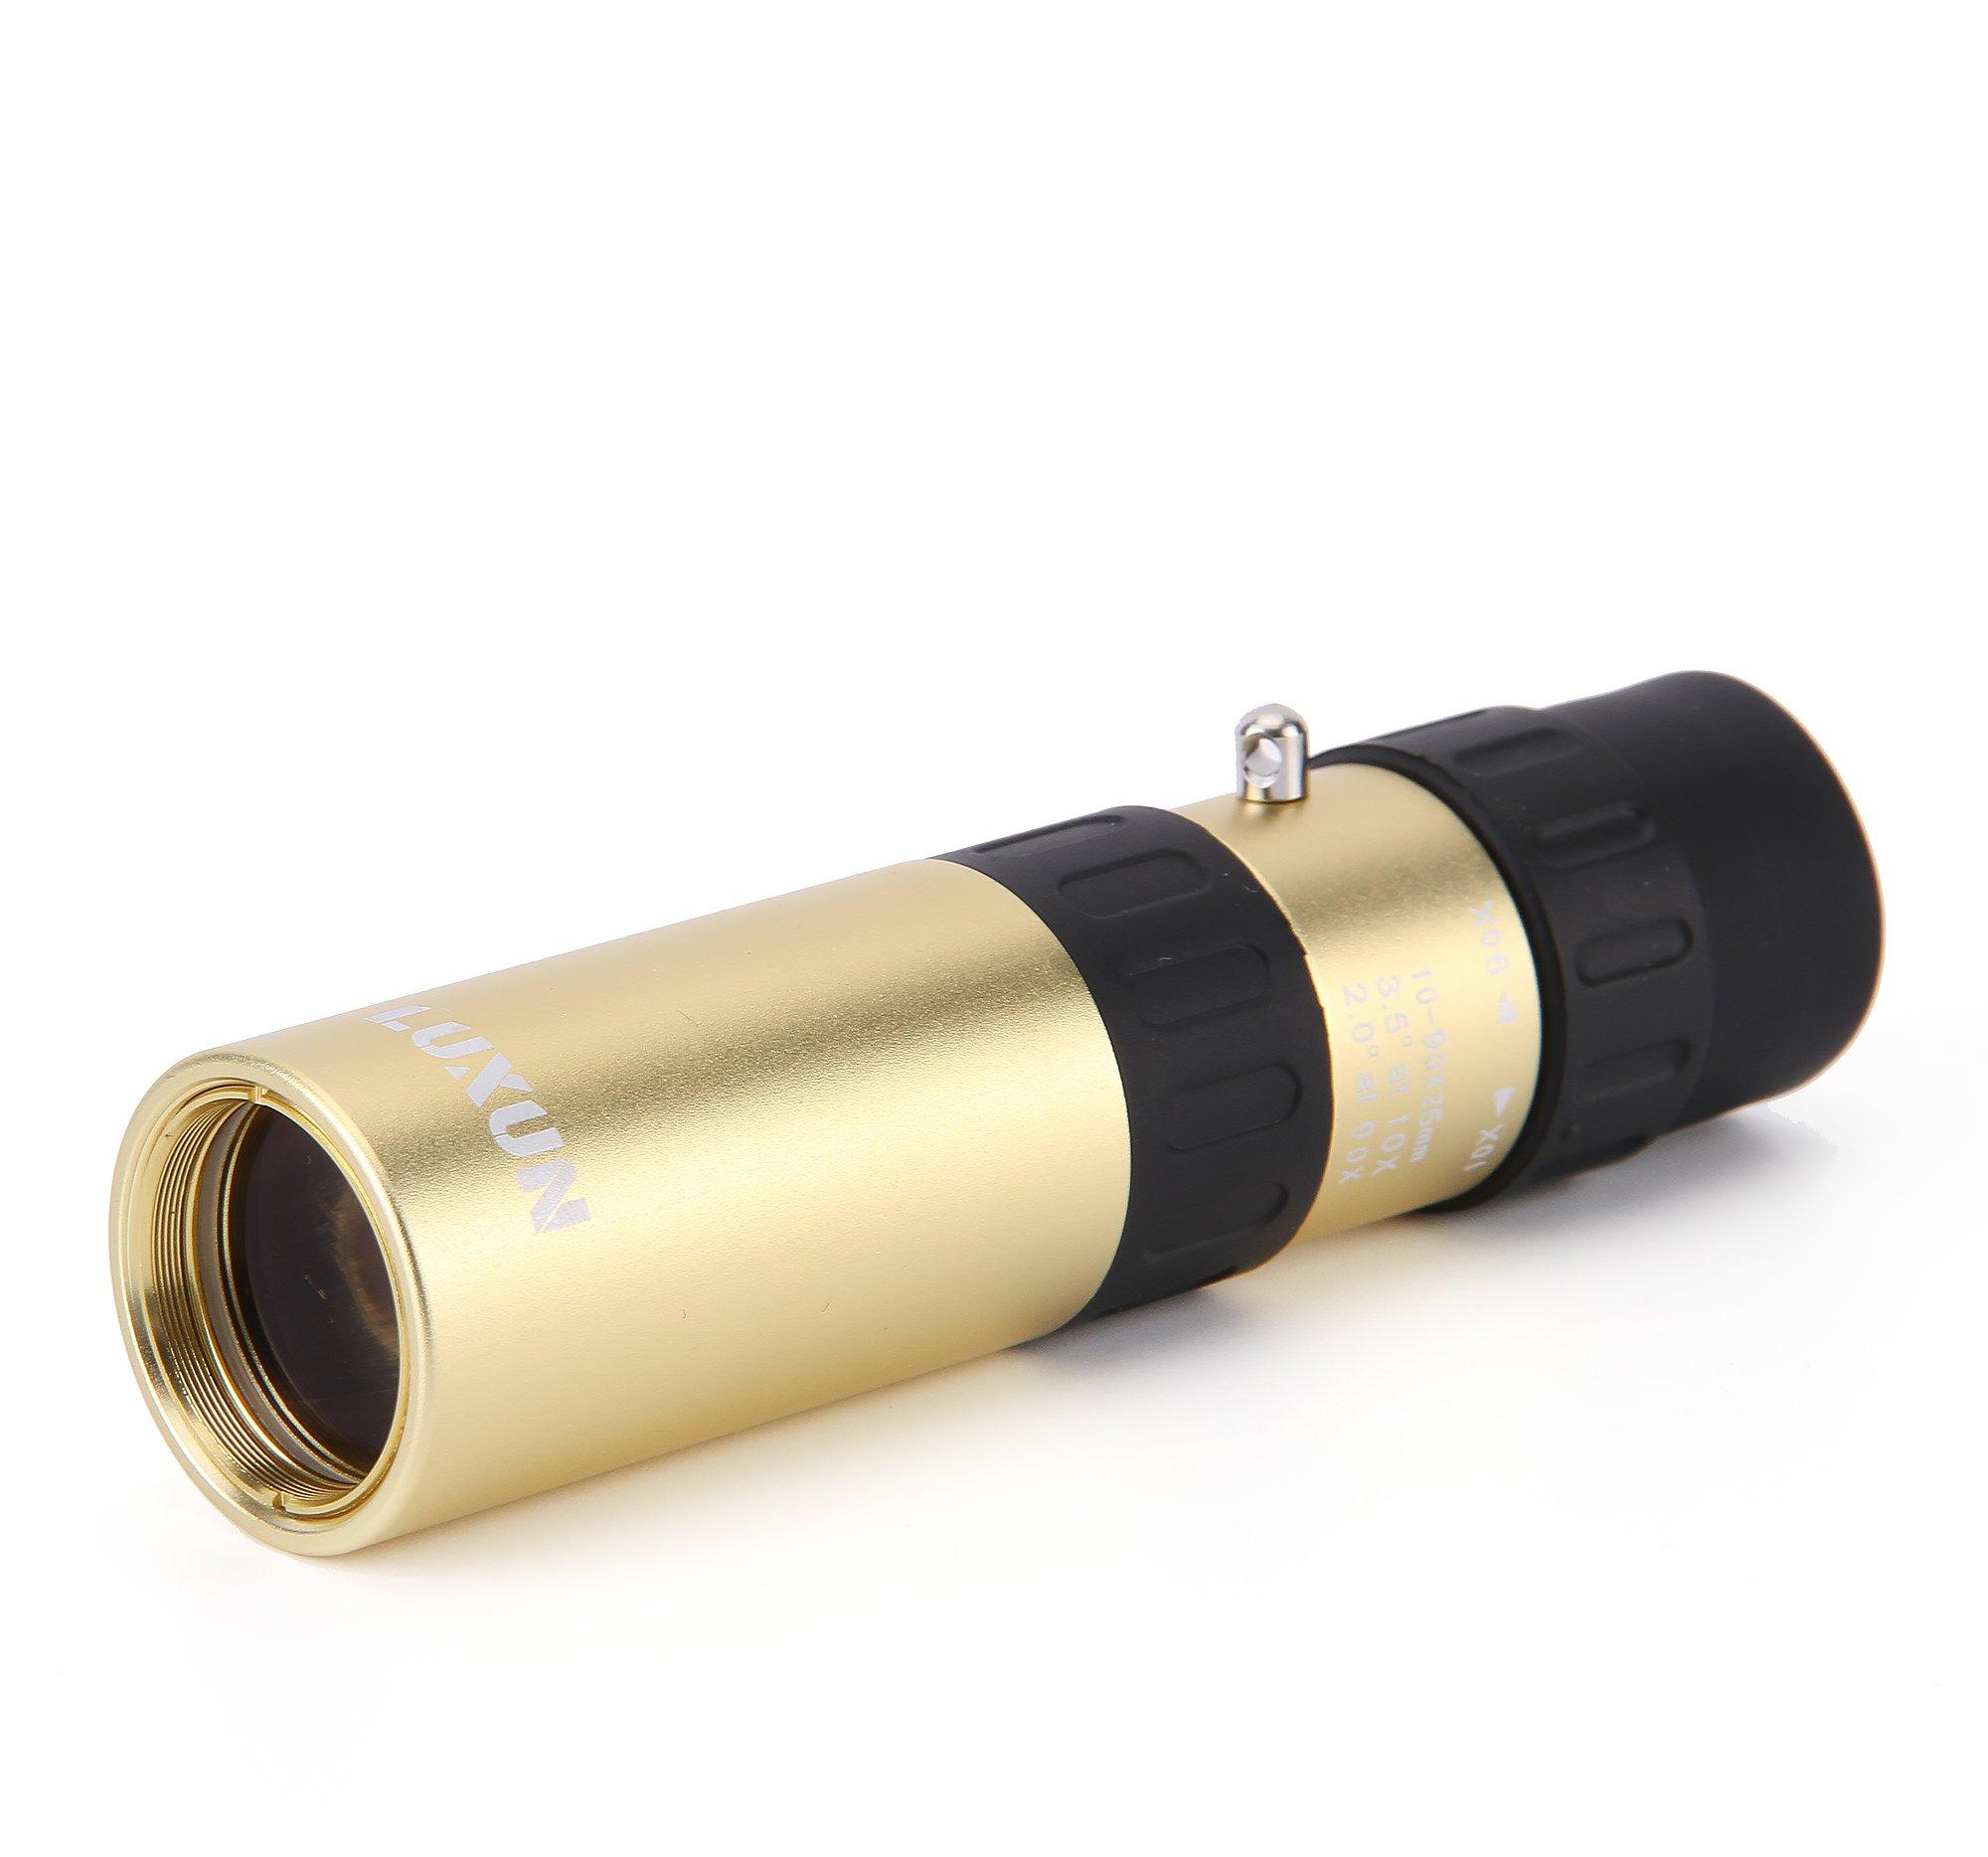 LU2000 25X90 Retro Pirate Telescopic Mini Monocular Telescope Brass Metal Mono Spy Spotting Scope With Carrying Bag